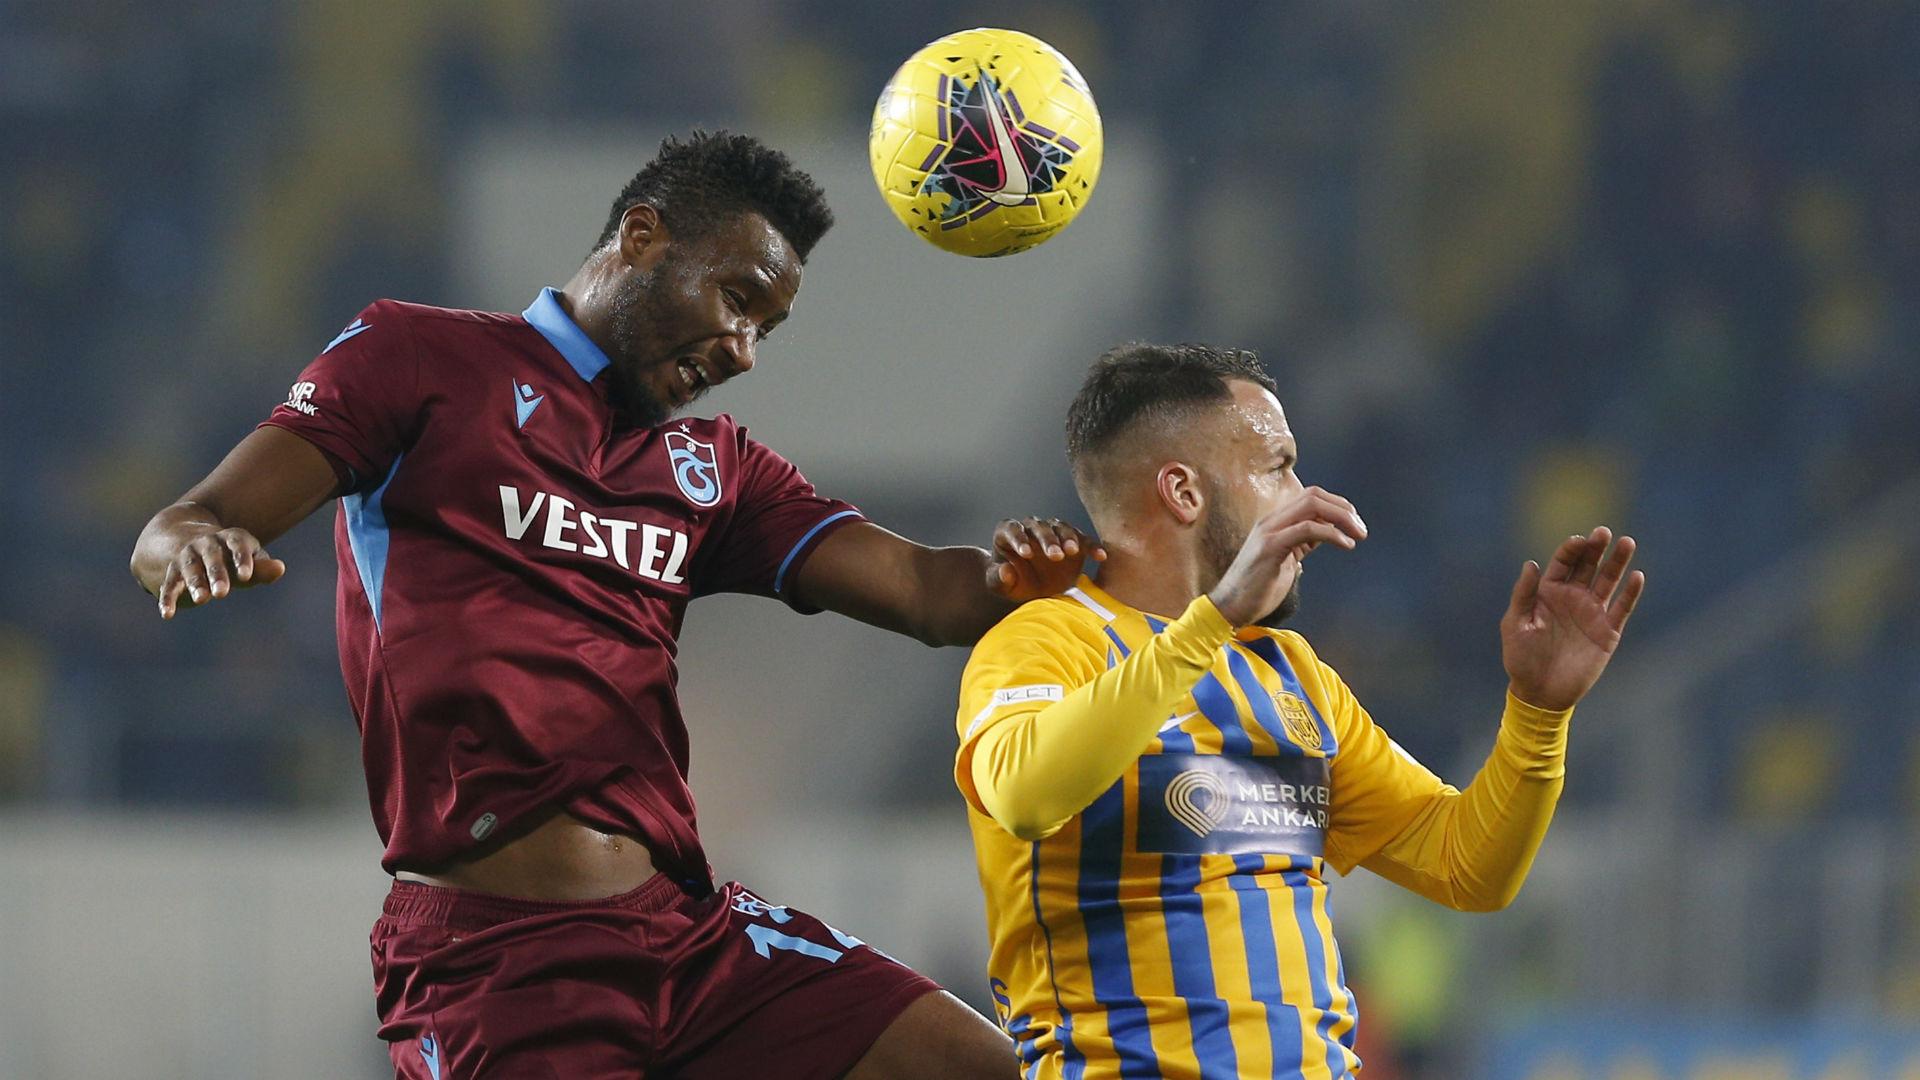 John Obi Mikel Ankaragucu v Trabzonspor 11232019